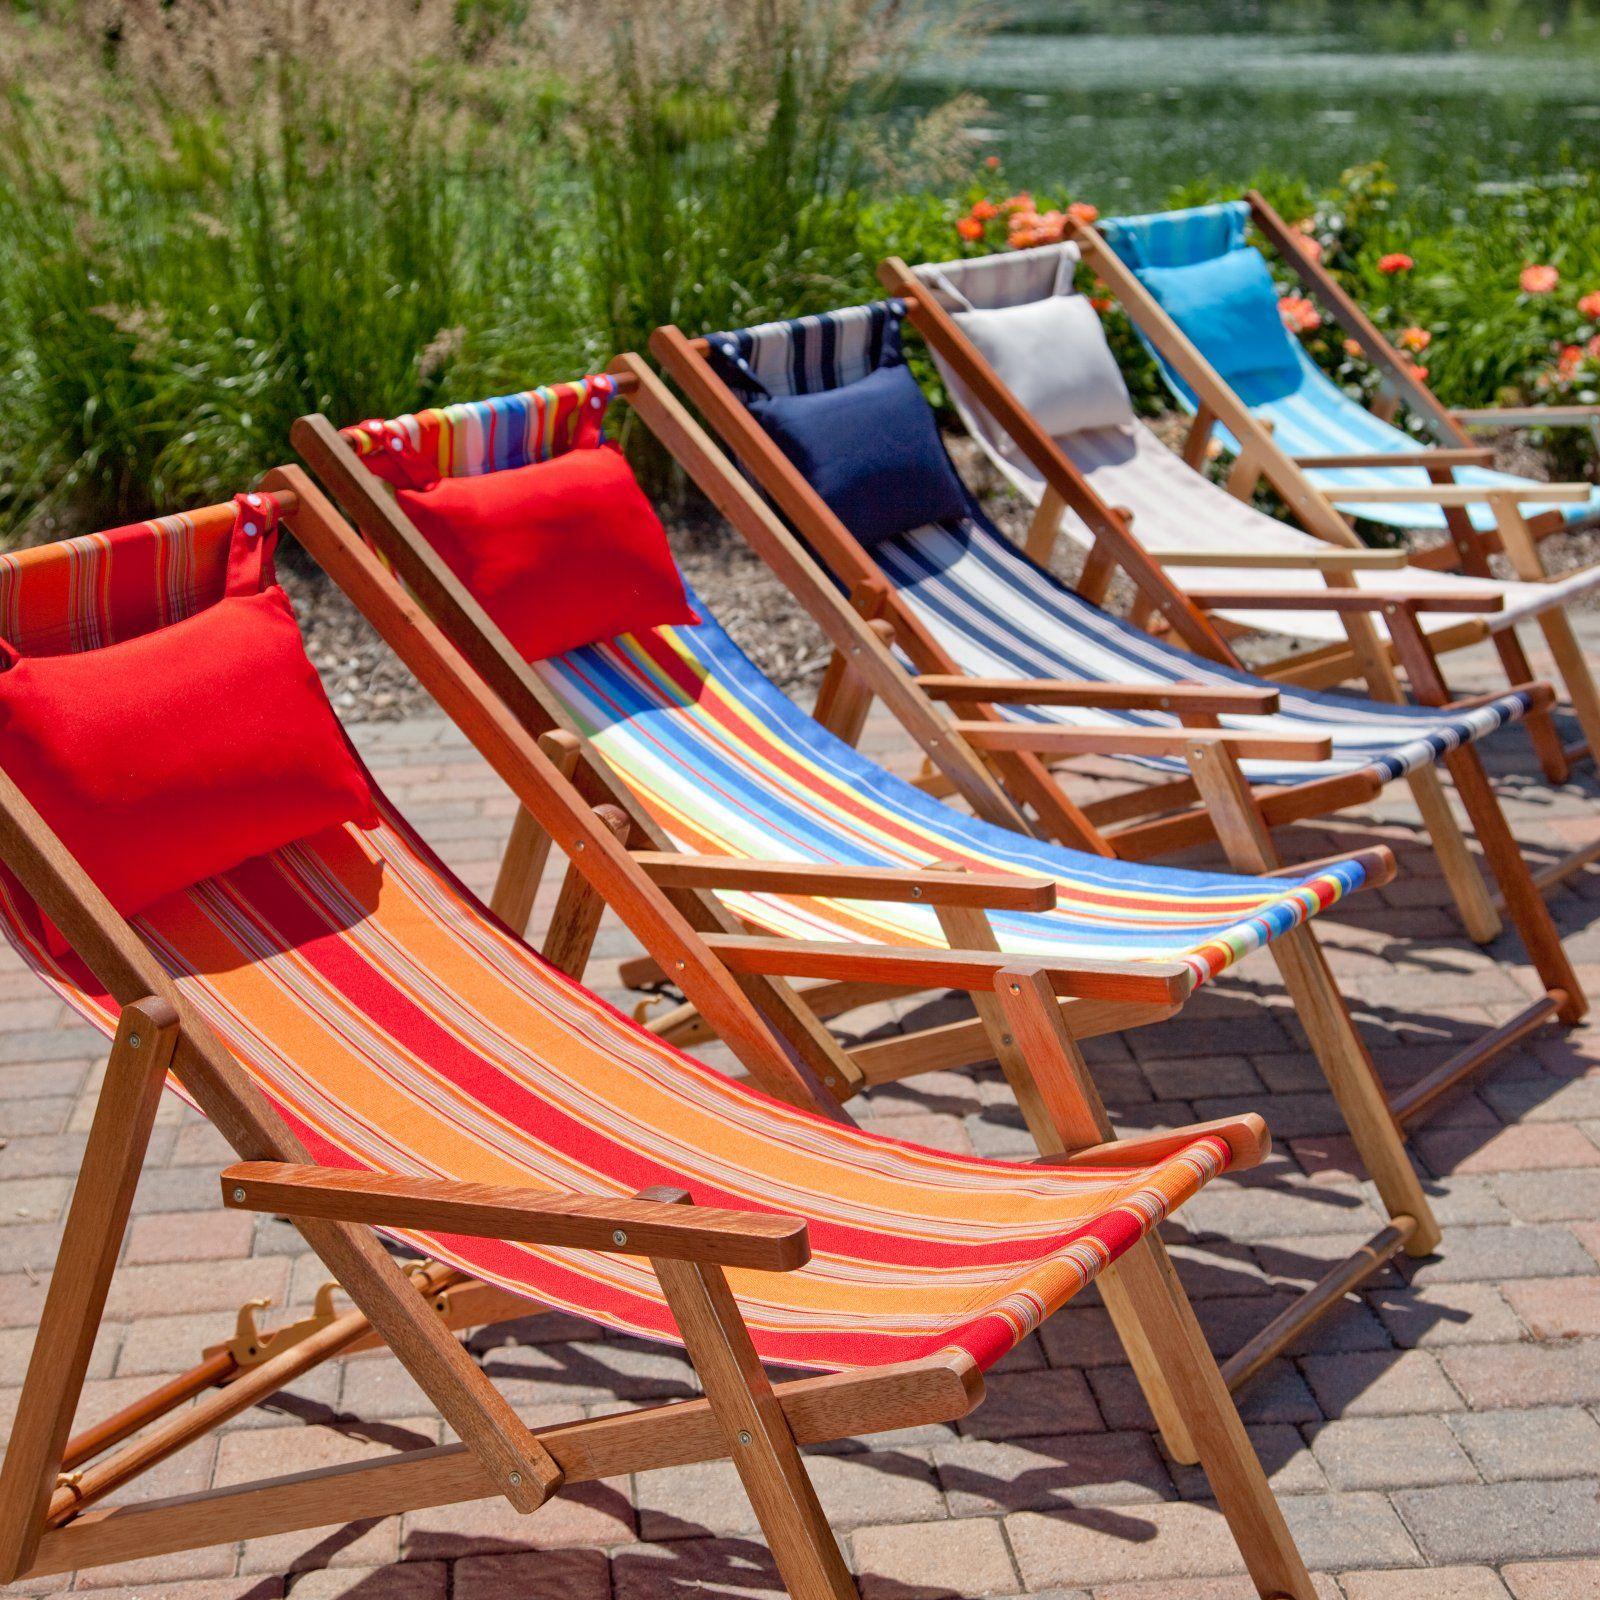 Deck and Beach Chair Lounger Beach Chairs at Hayneedle